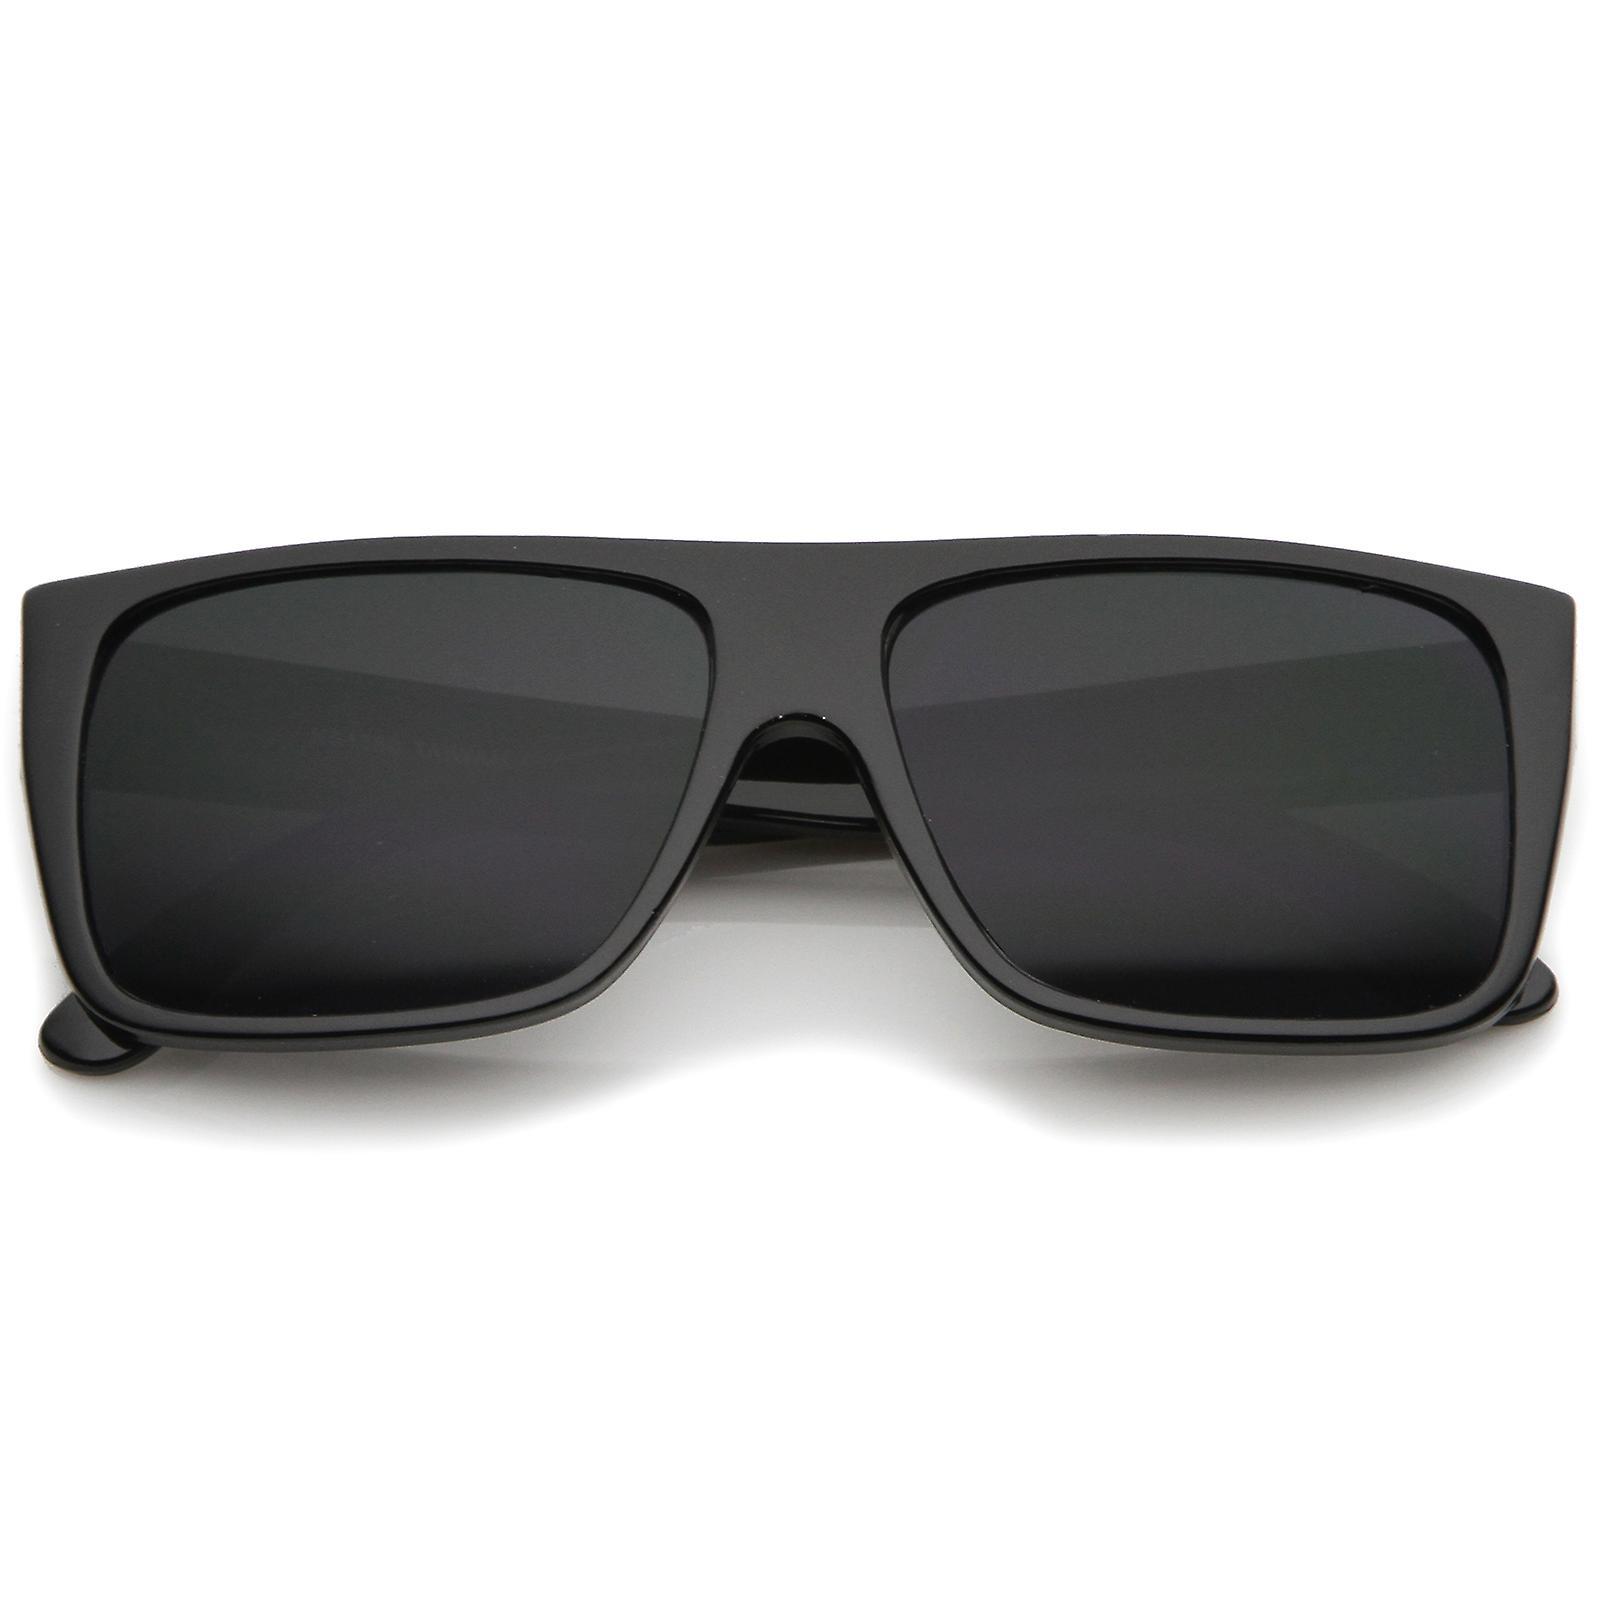 Retrô grande Flat Top templo Eazy E estilo retângulo óculos de sol 57mm d6359cfc02